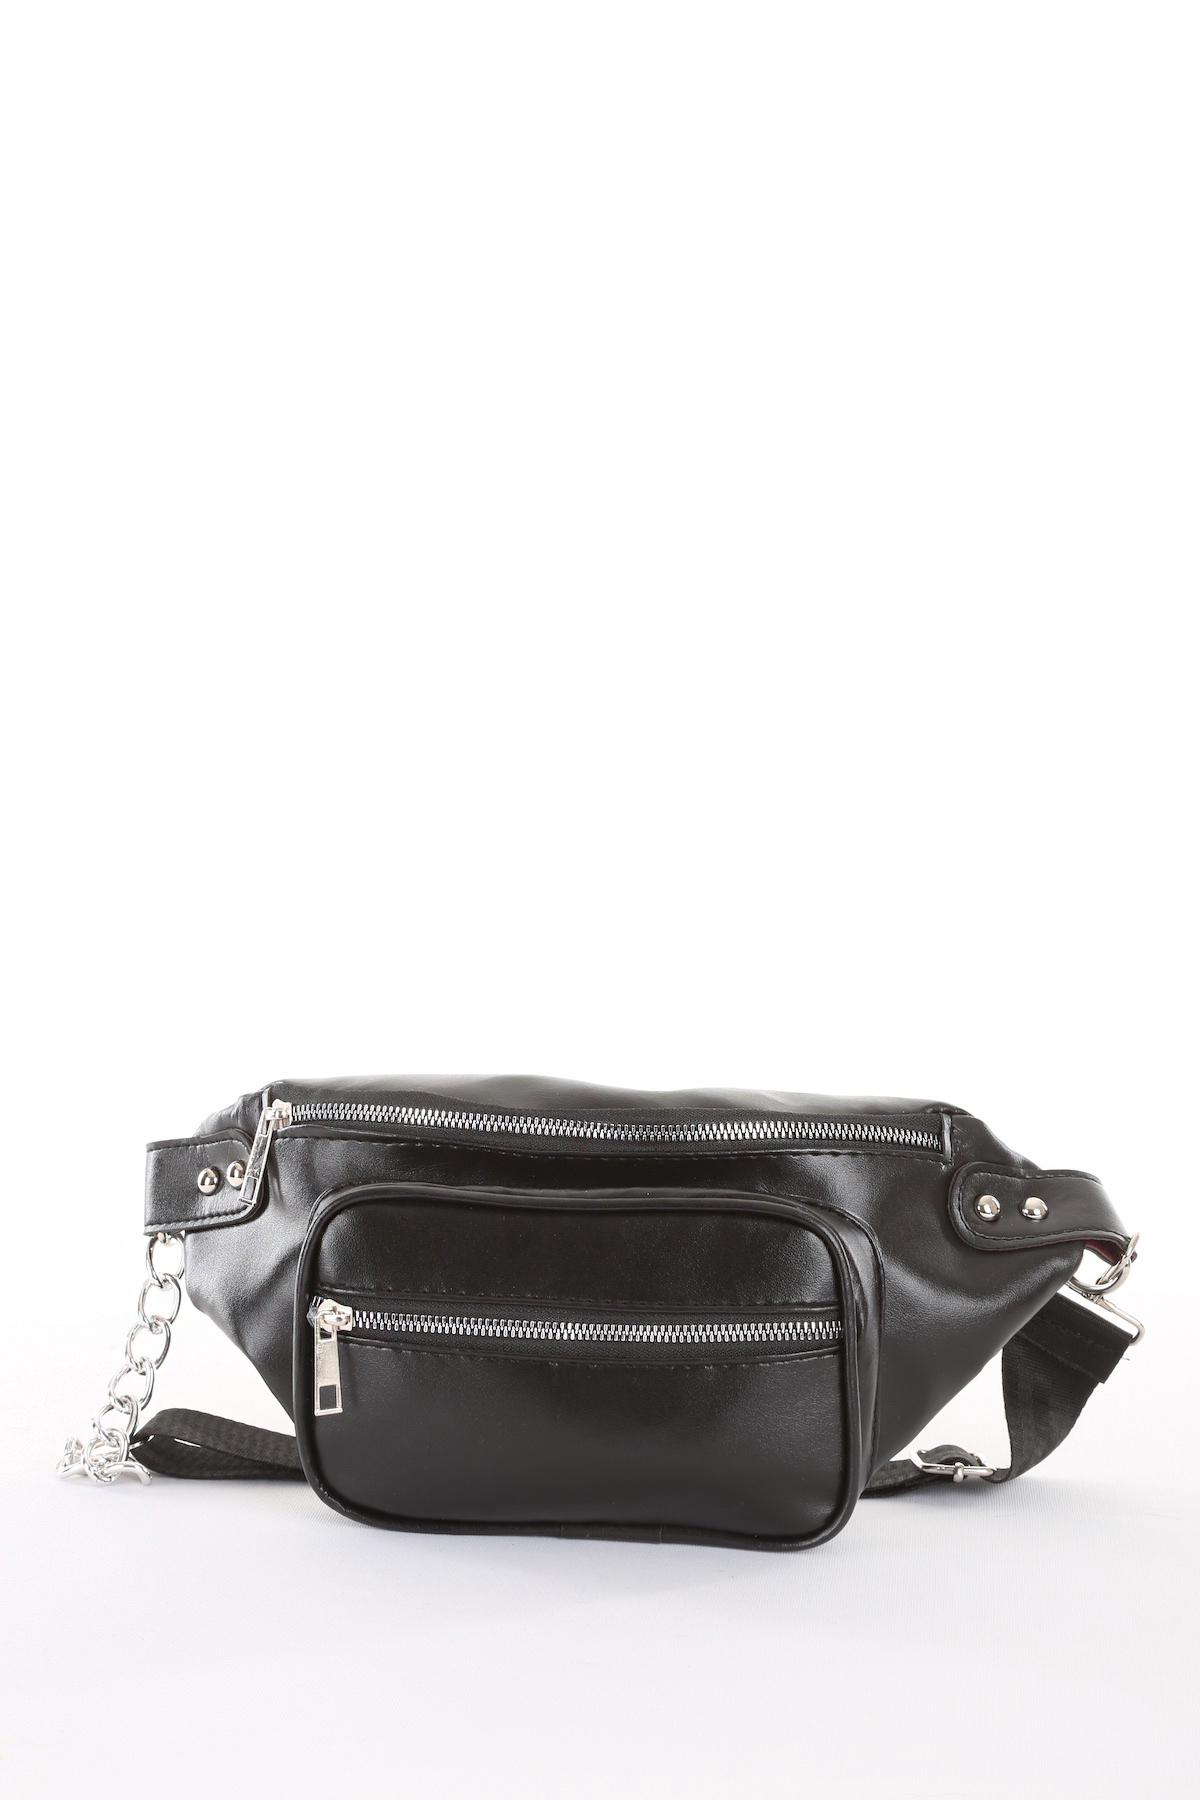 Women's Double Zipped Waist Bag